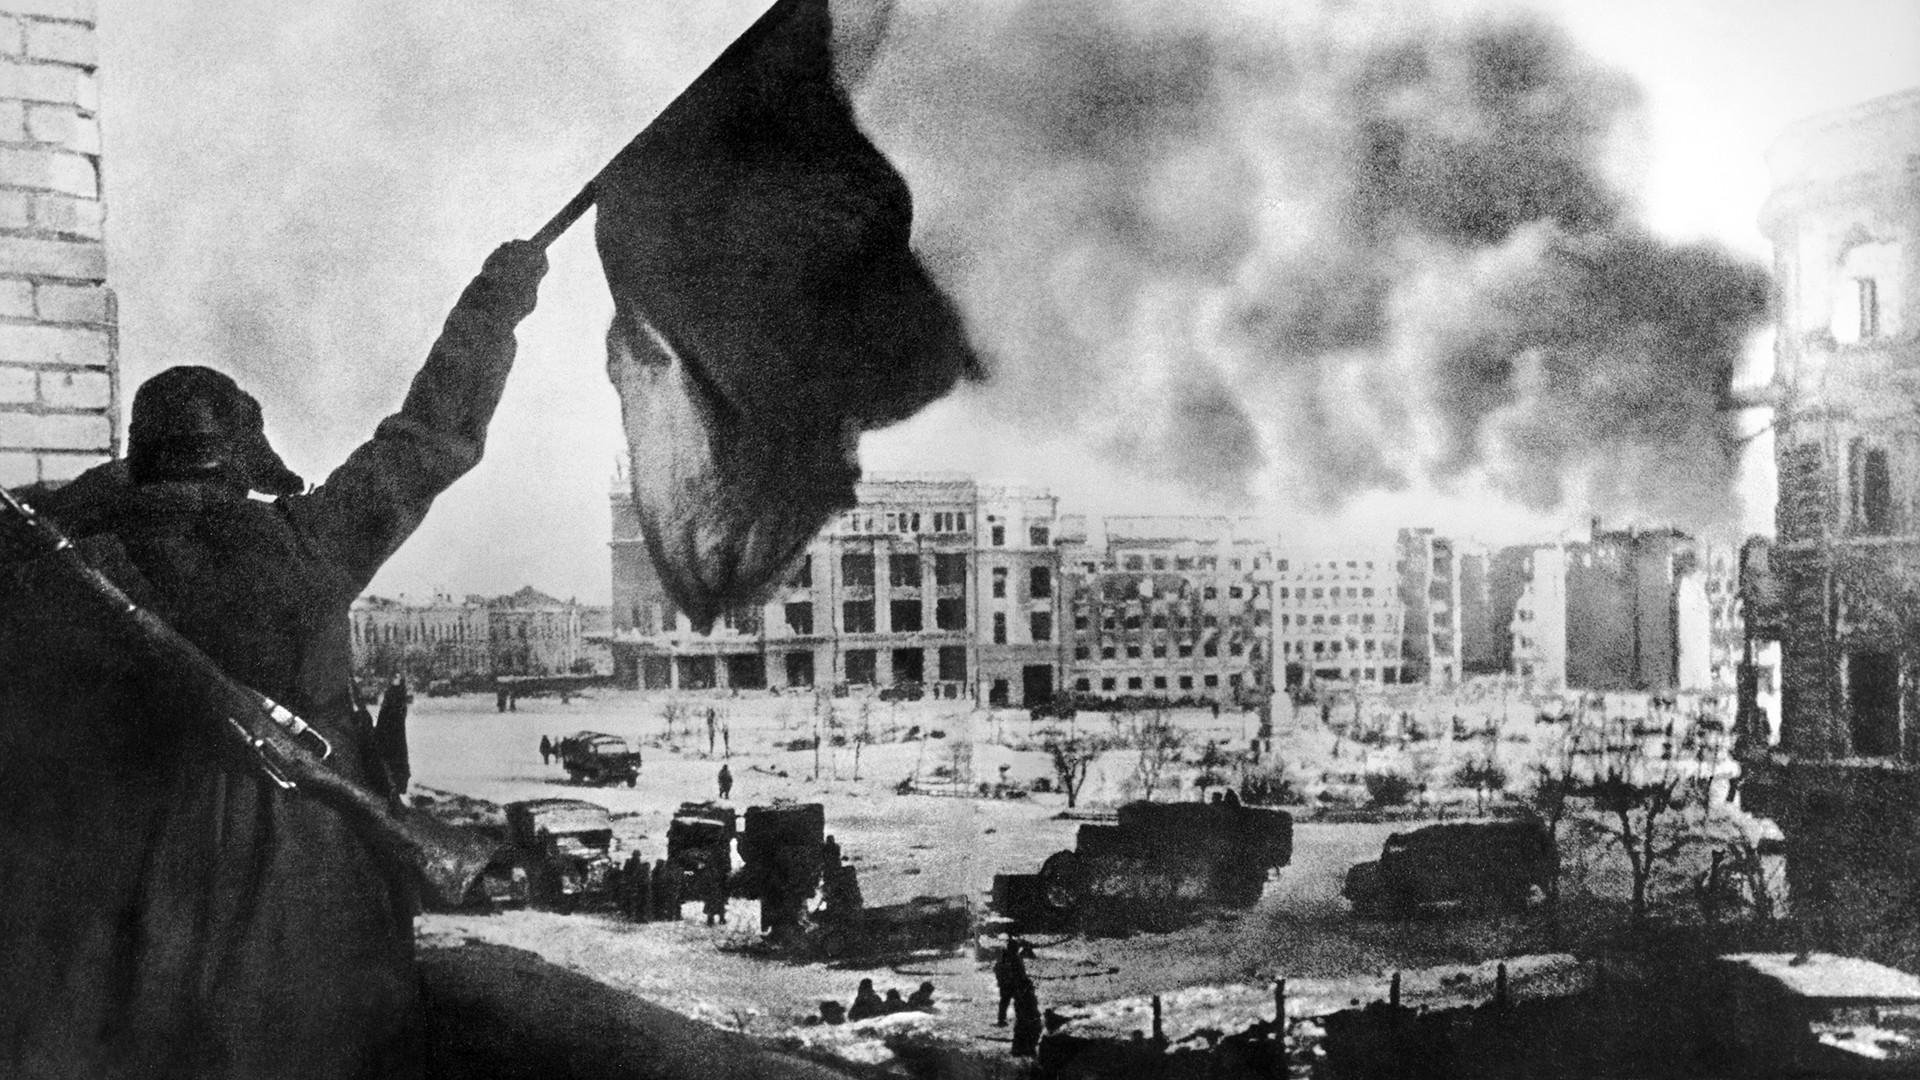 Sowjetische Soldaten schwenken ihre Flagge über dem zentralen Platz  in Stalingrad